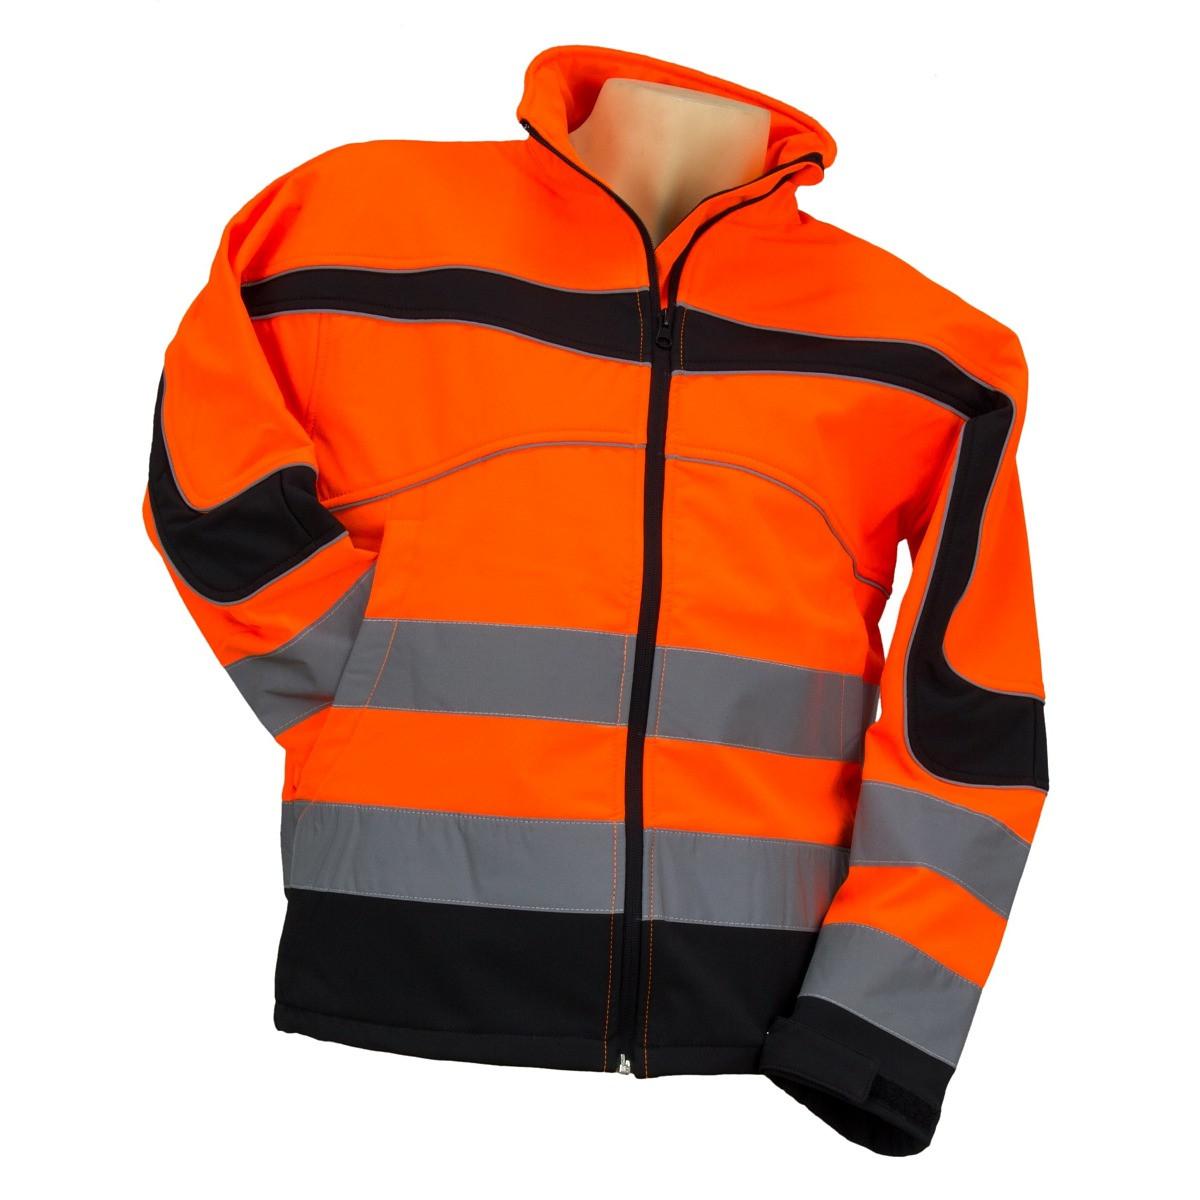 Куртка STRZEGAWCZY POMARAŃ з светотражающими смугами, чорно-помаранчевого кольору. Urgent (POLAND)